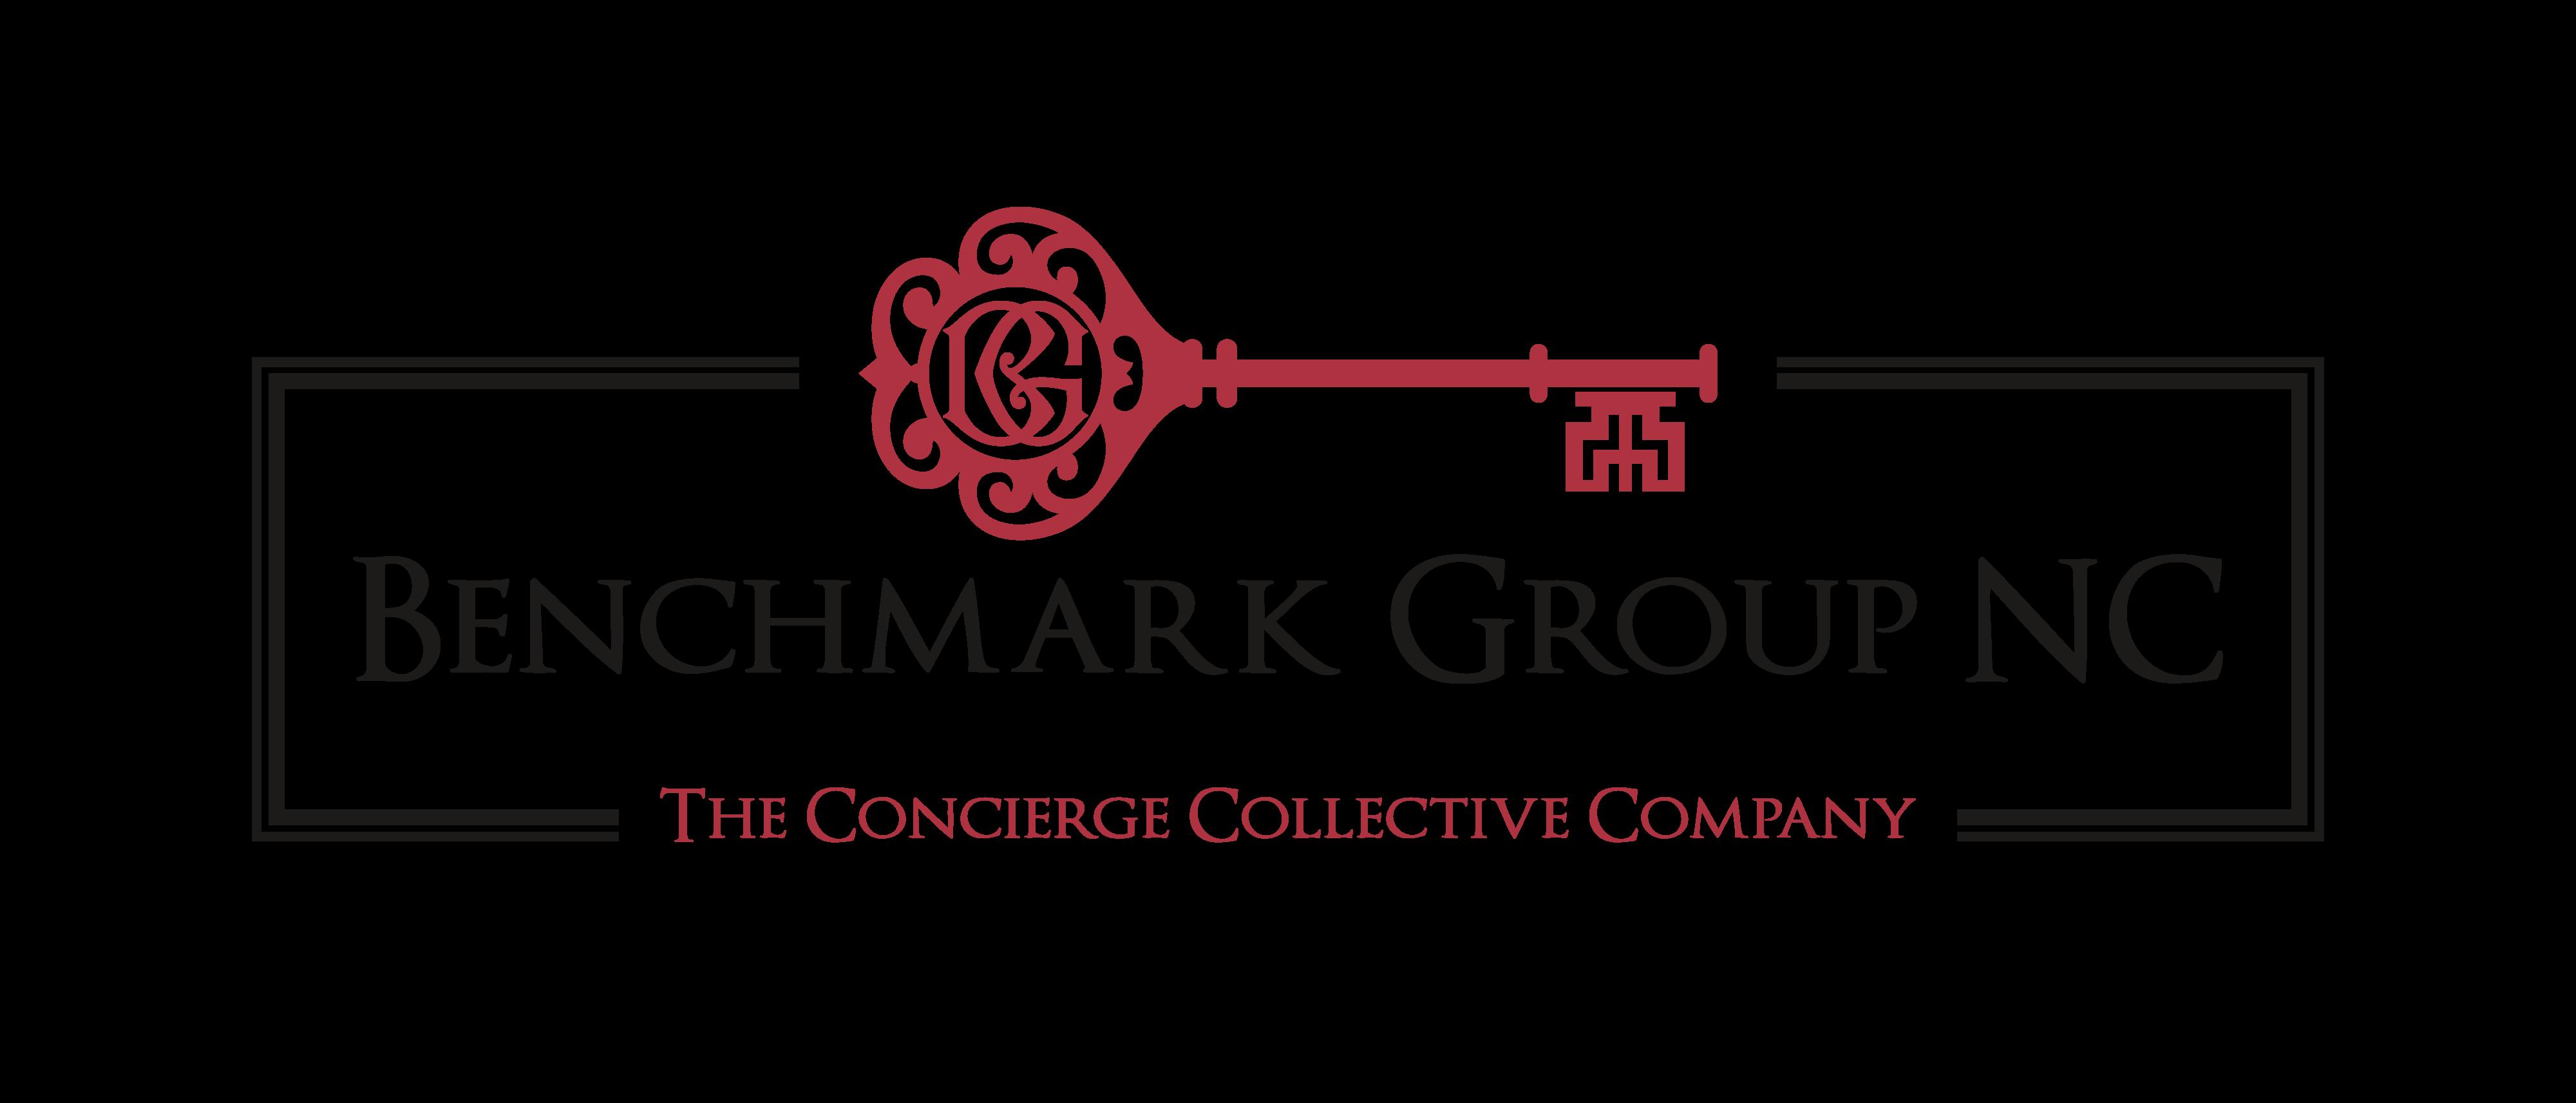 BUSINESS CARD EDITS - URGENT TIMELINE - BENCHMARK GROUP NC